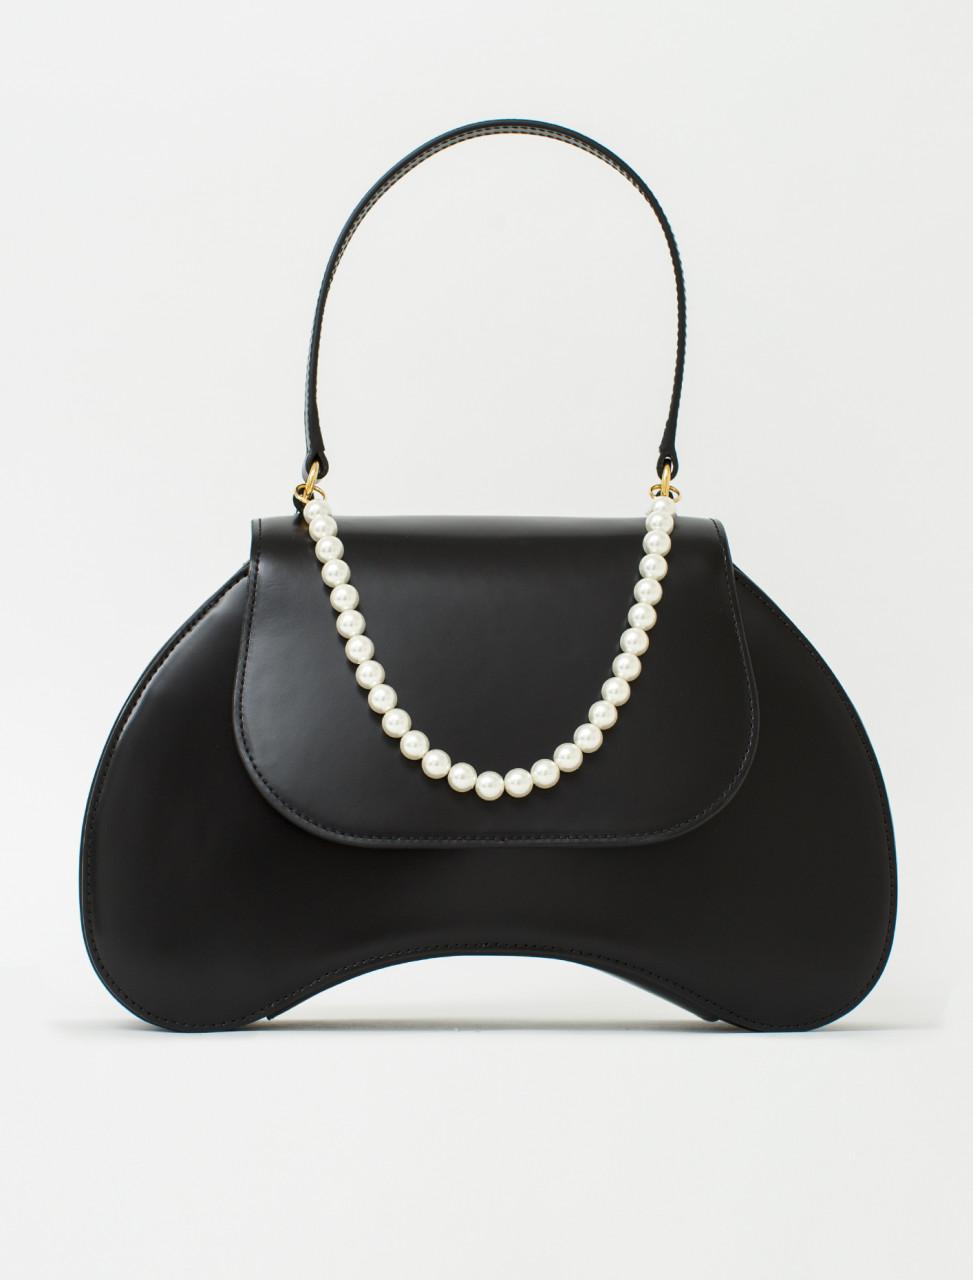 Handheld Leather Bean Bag